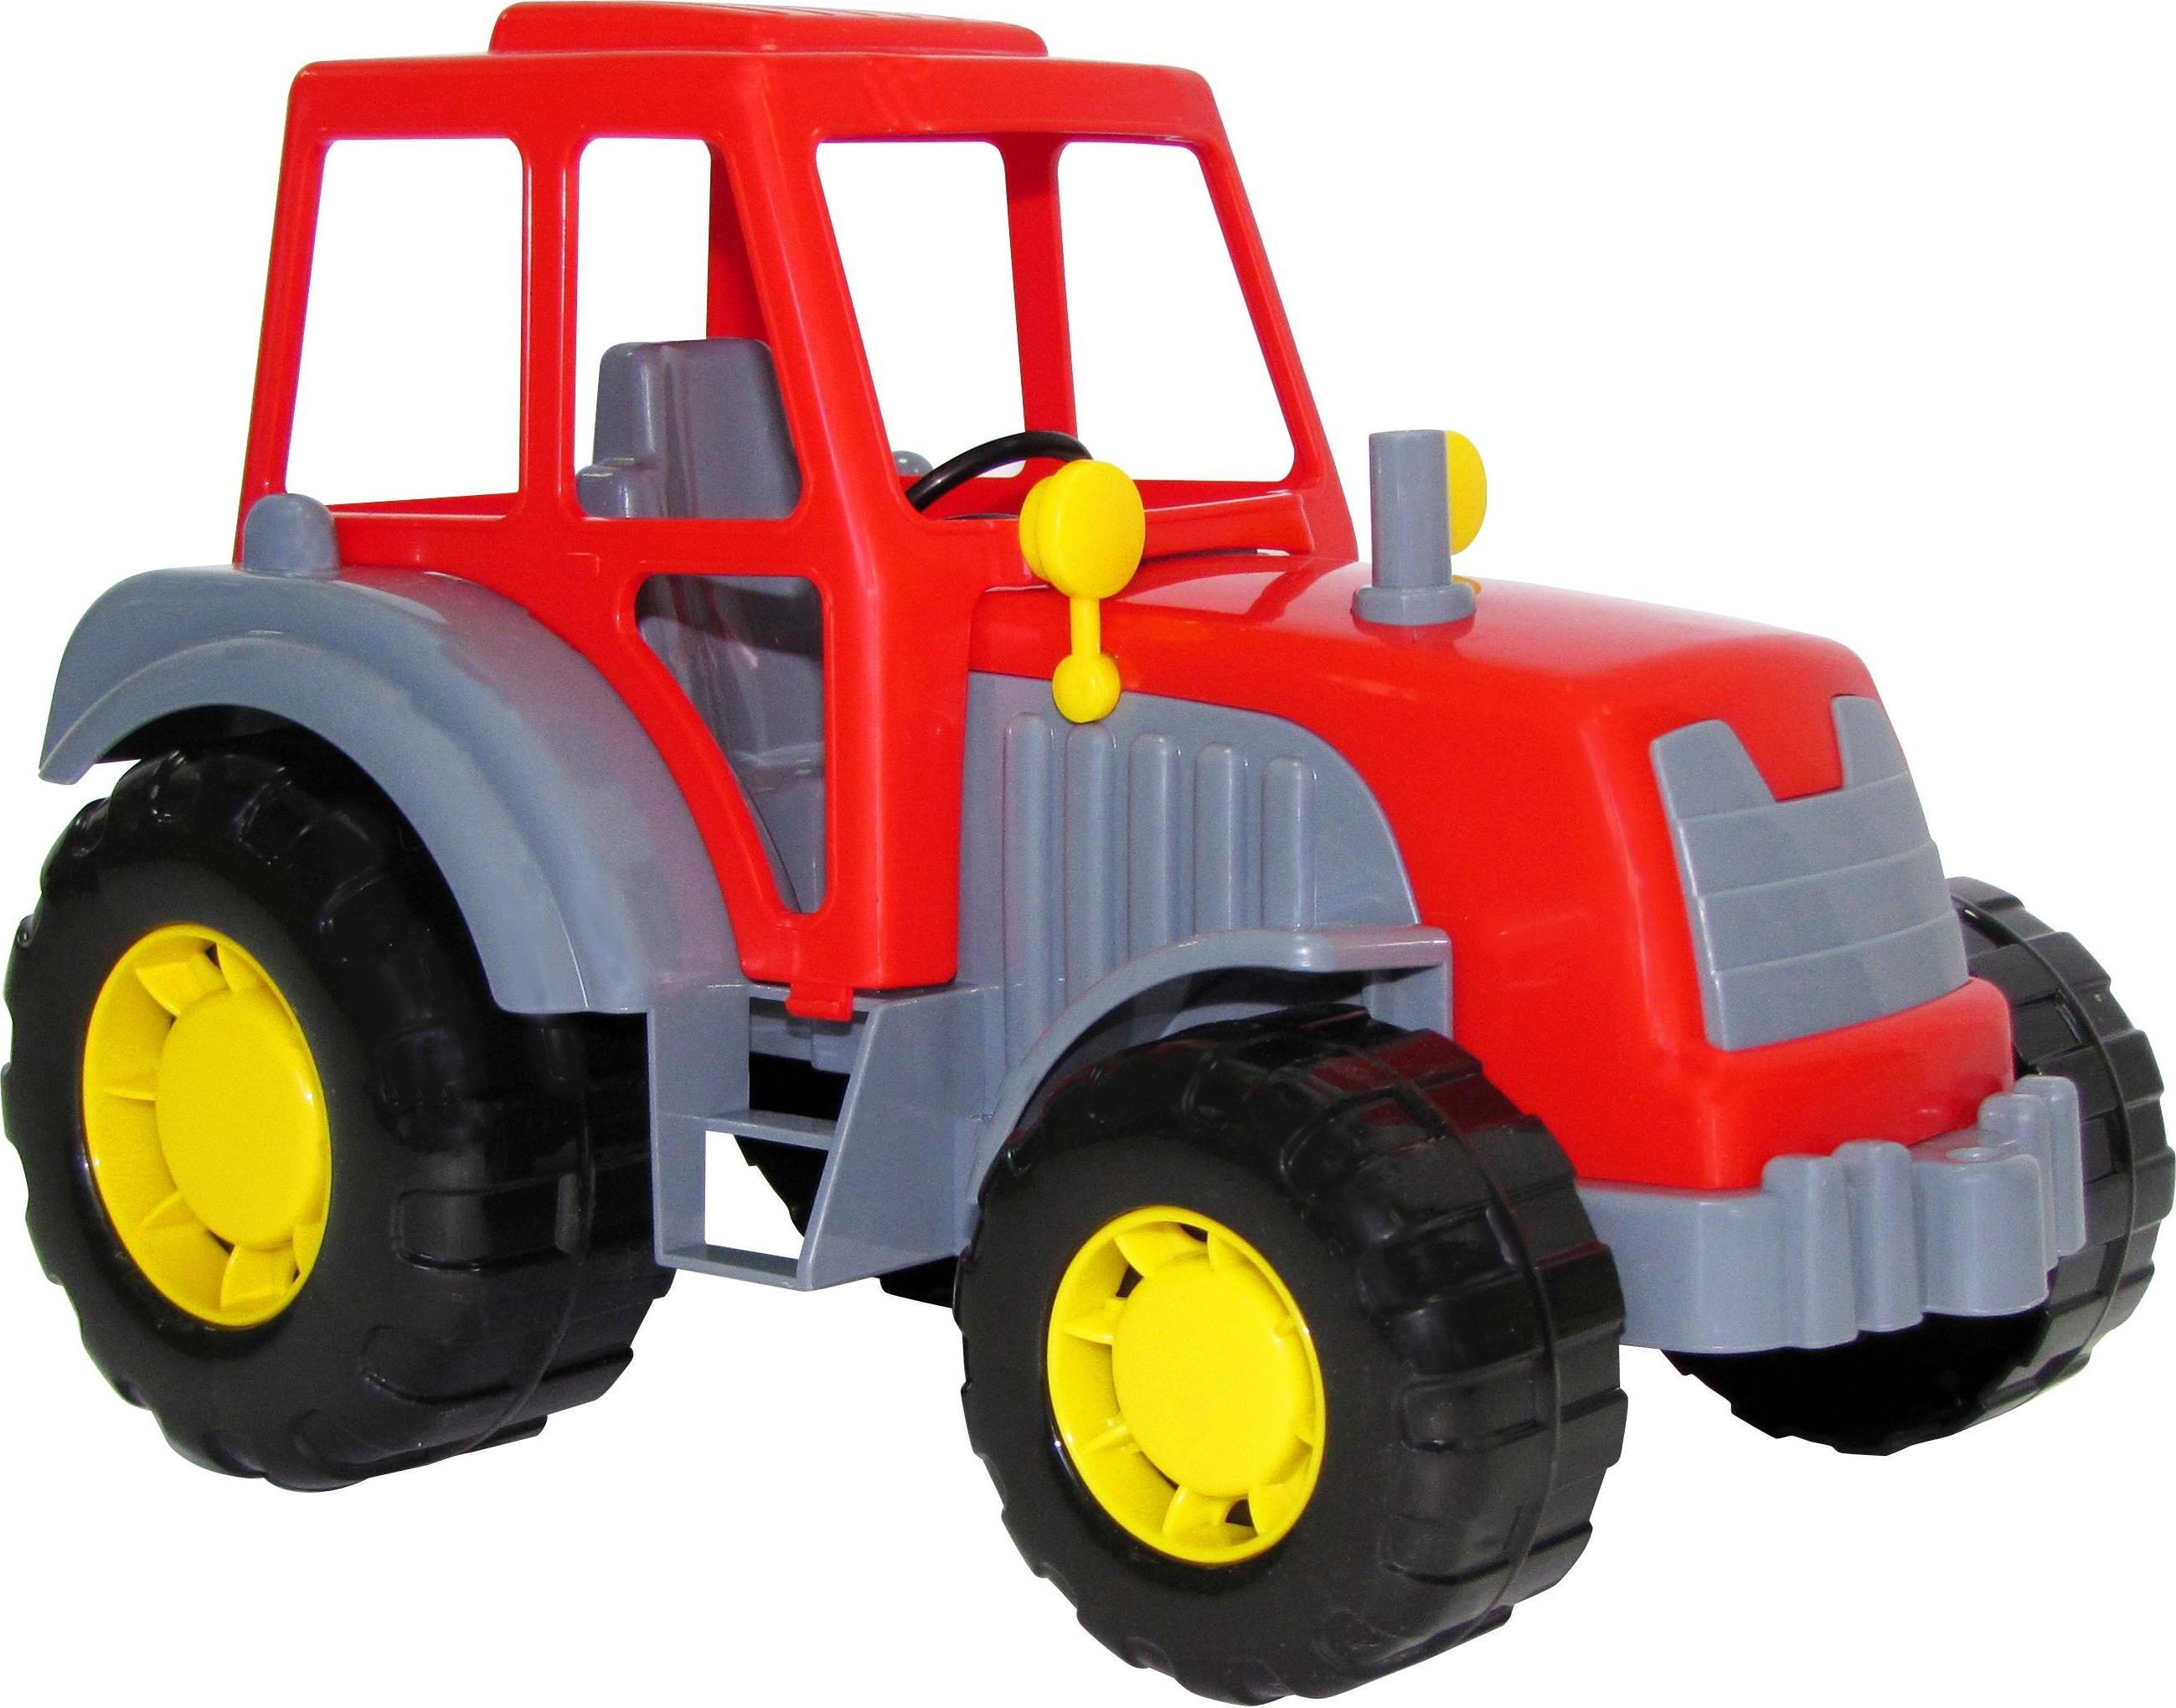 Трактор АлтайИгрушечные тракторы<br>Трактор Алтай<br>